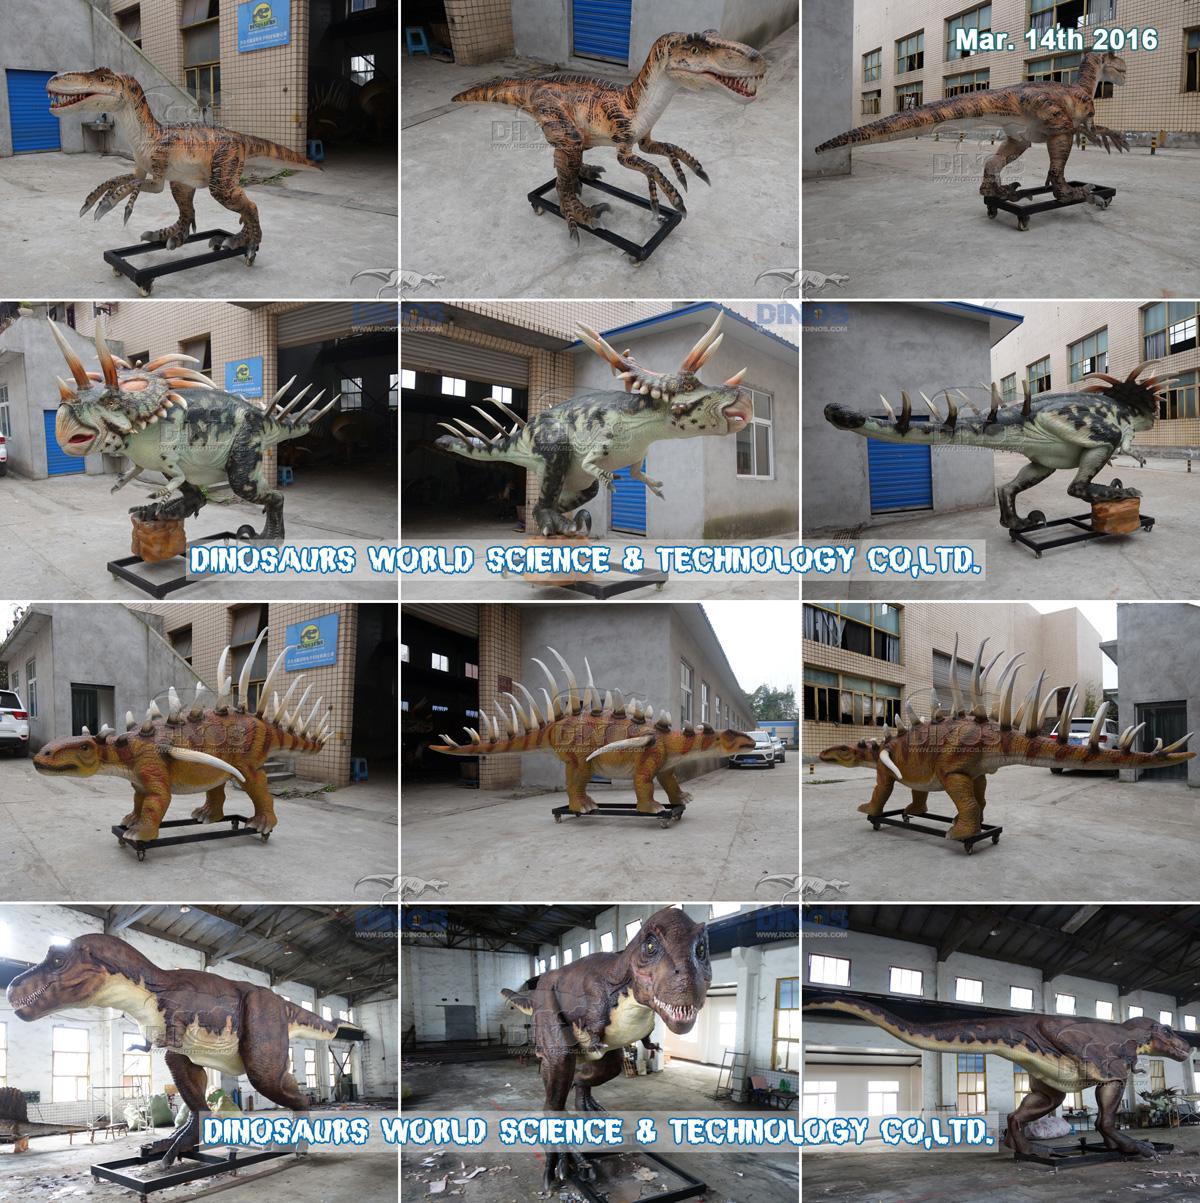 animatronic dinosaurs,fiberglass dinosaurs